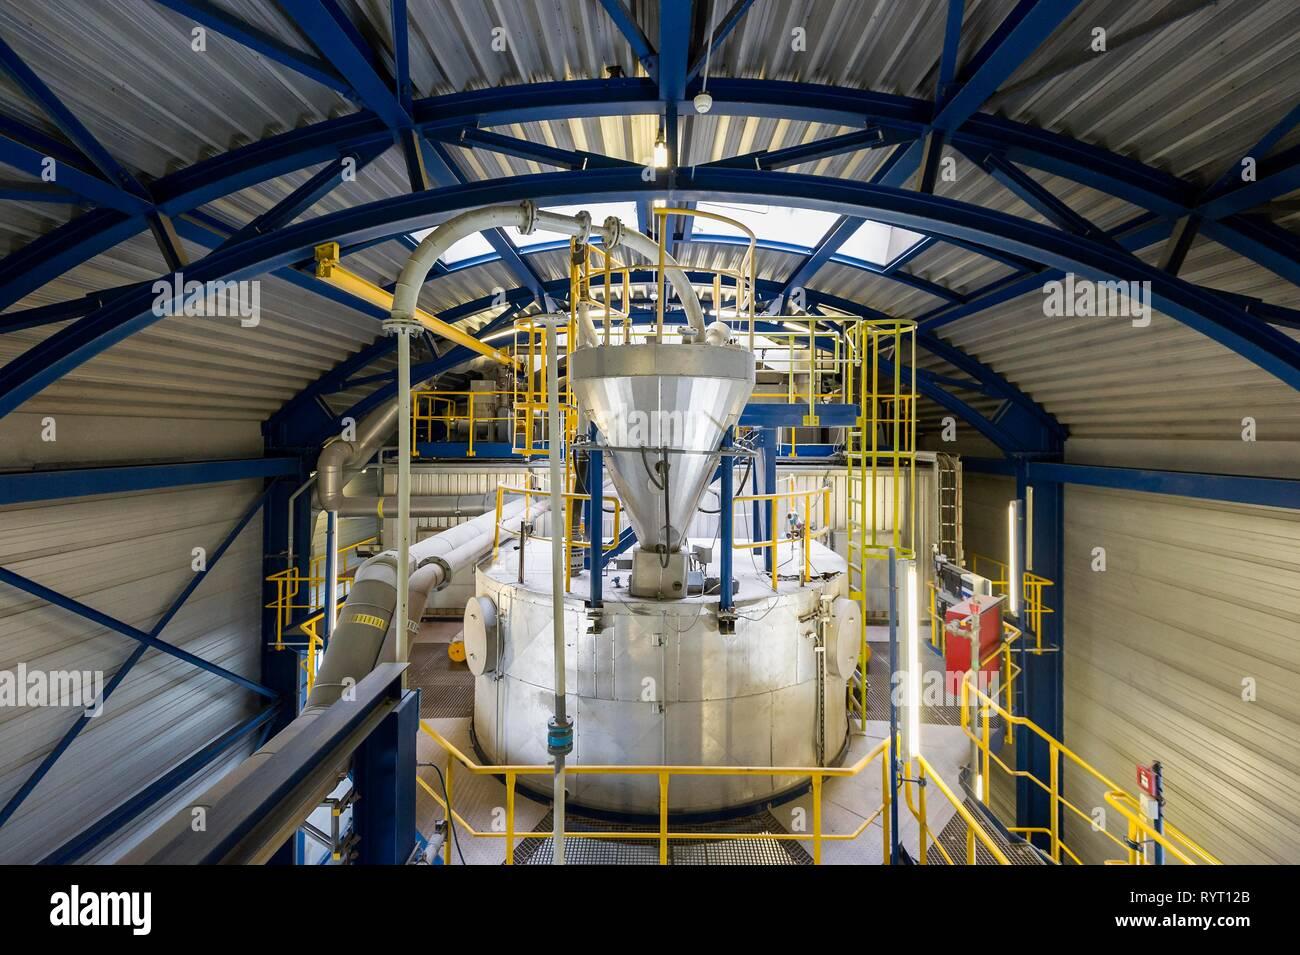 Waste gas purification plant, waste incineration plant, TREA Breisgau, Eschbach, Baden-Württemberg, Germany - Stock Image